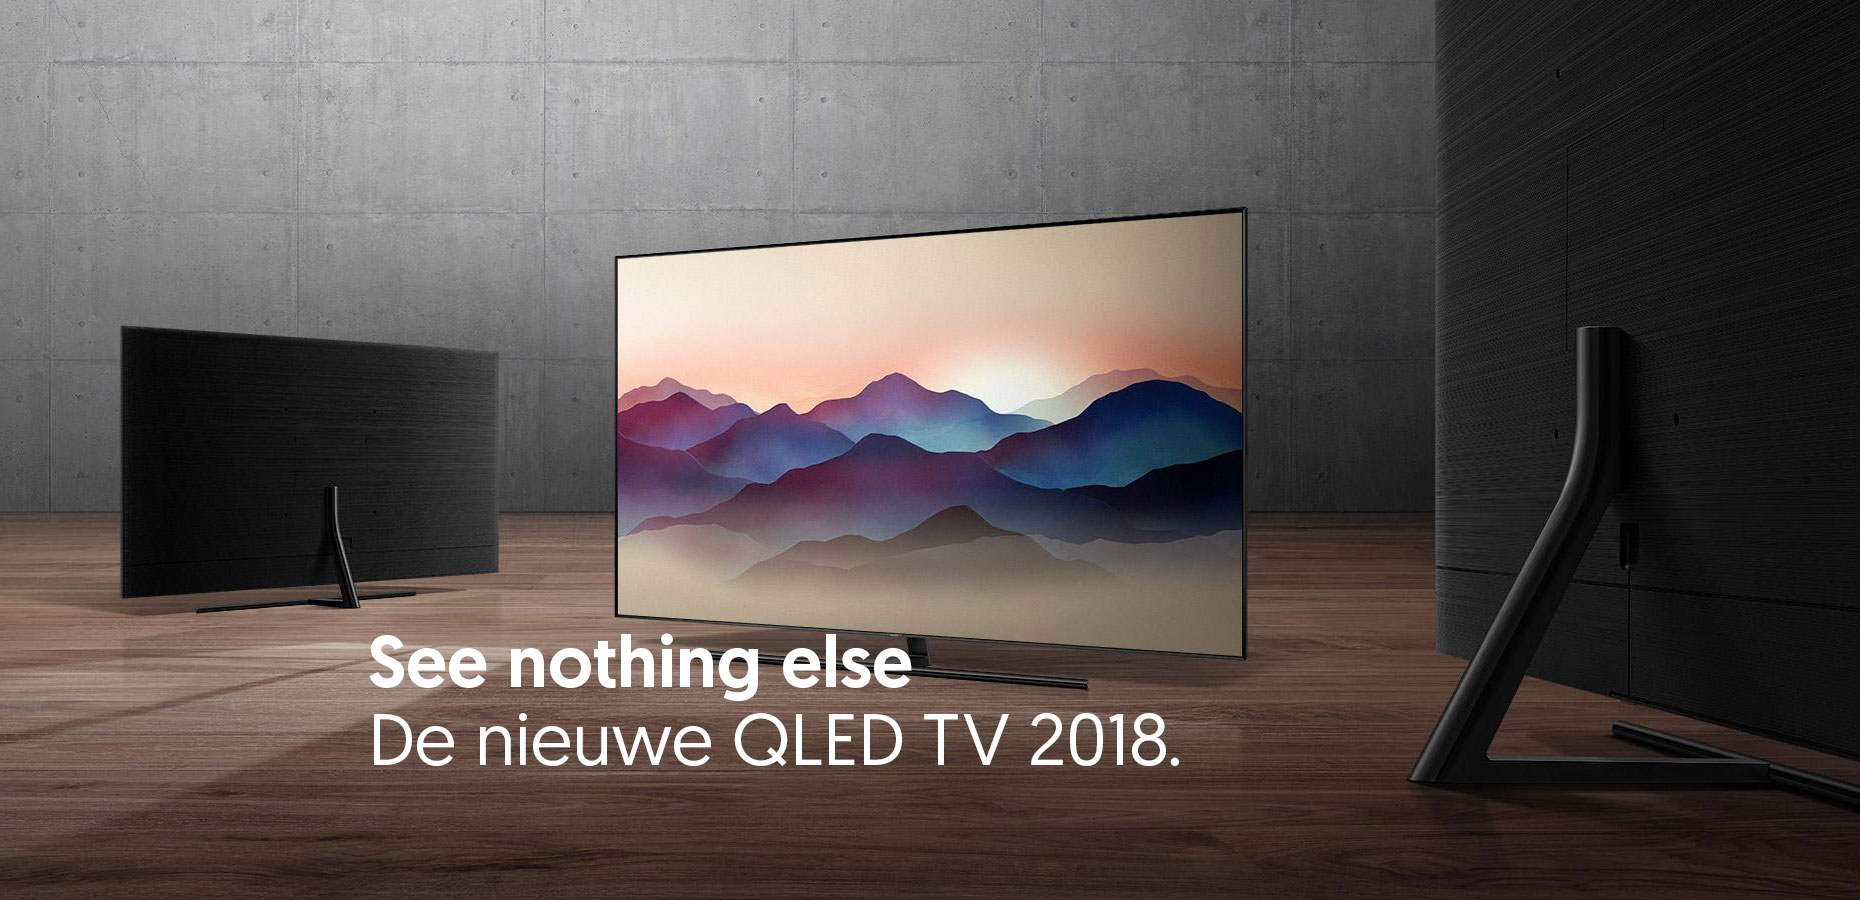 header_tv-advies_nl_002